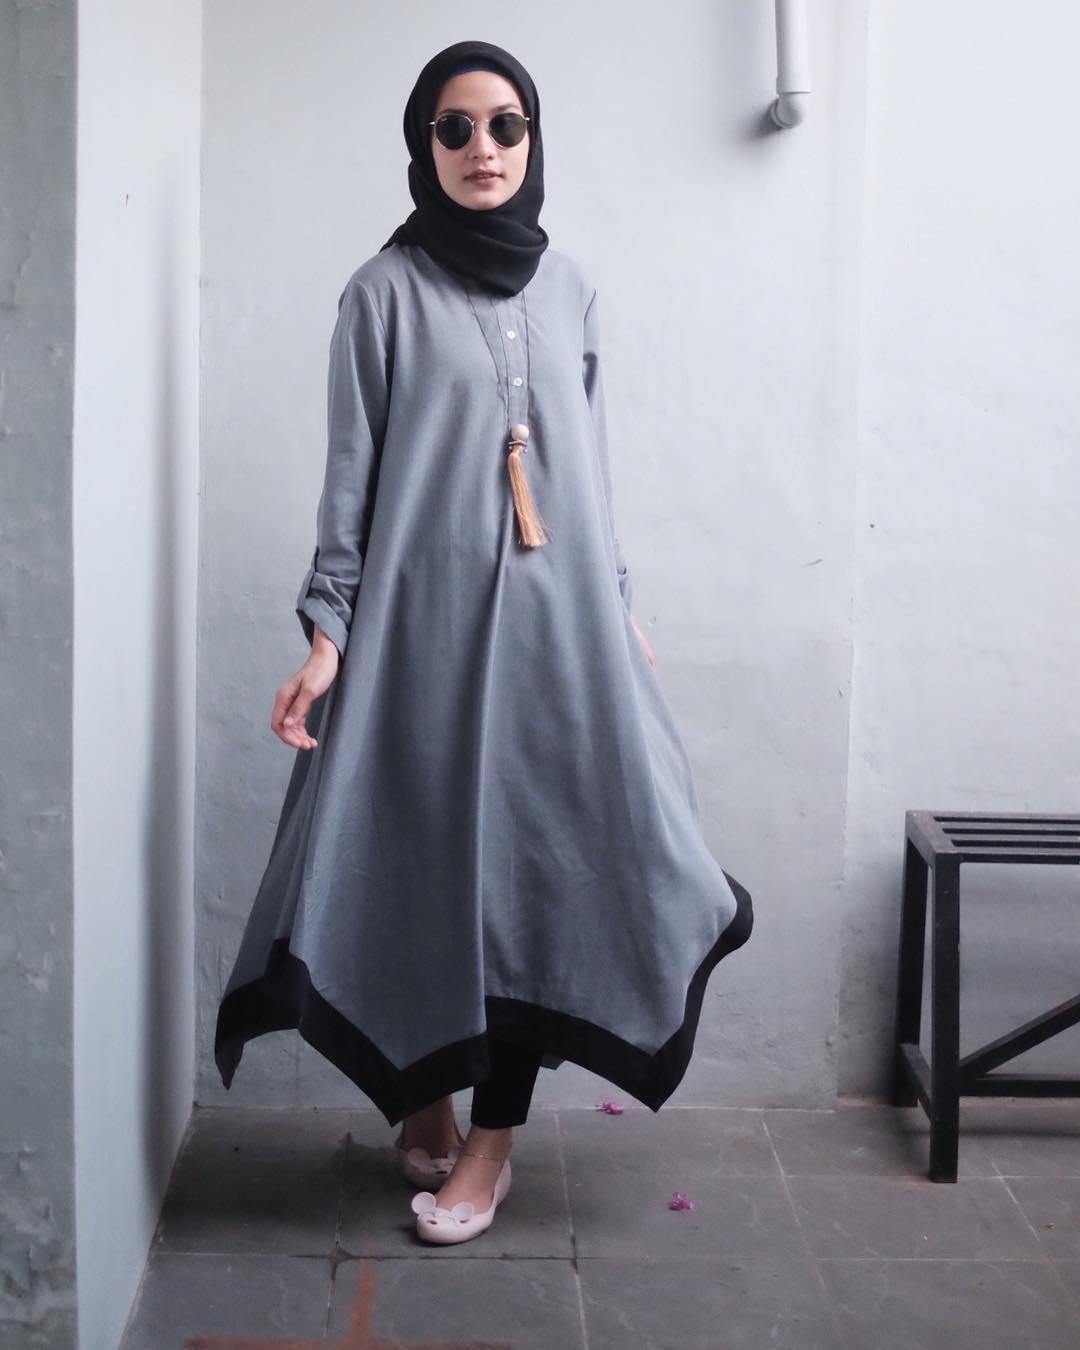 10 Style Hijab Kece Buat Cewek Bertubuh Kurus Mau Tiru